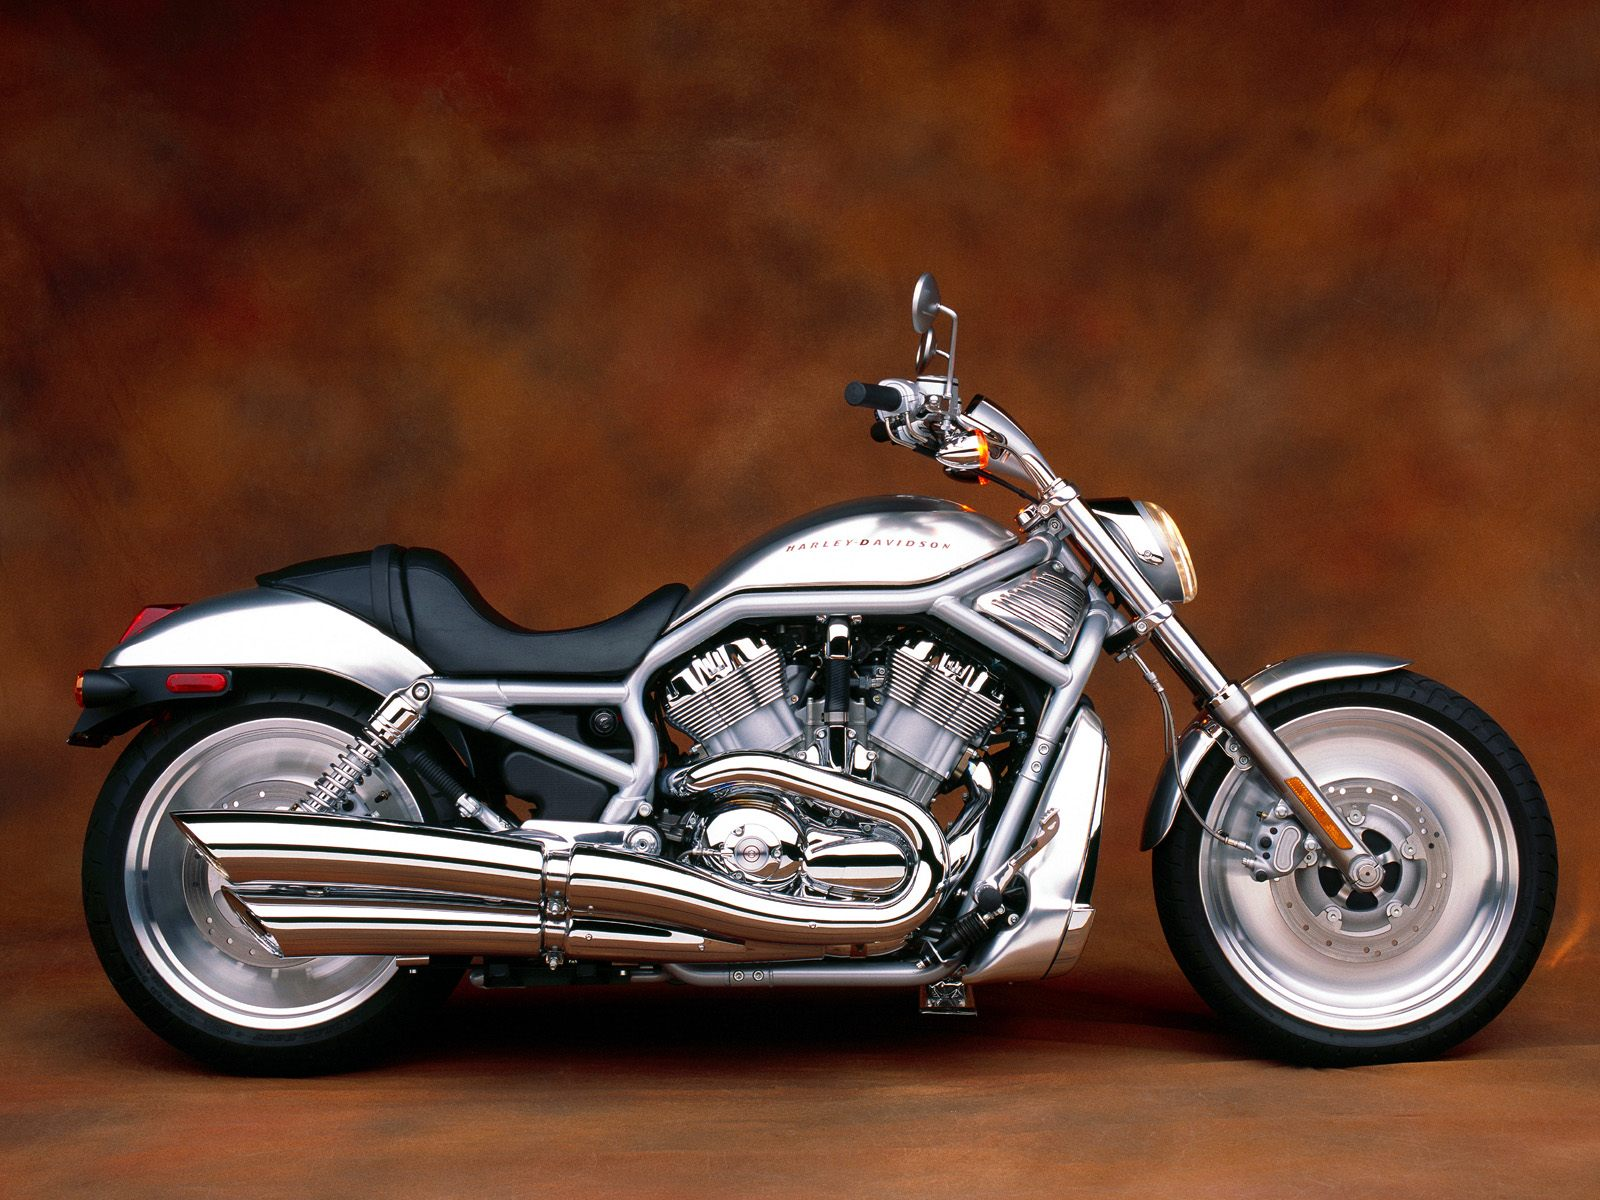 Harley Davidson Video Rb20det Maf Wiring Diagram Auto Review La